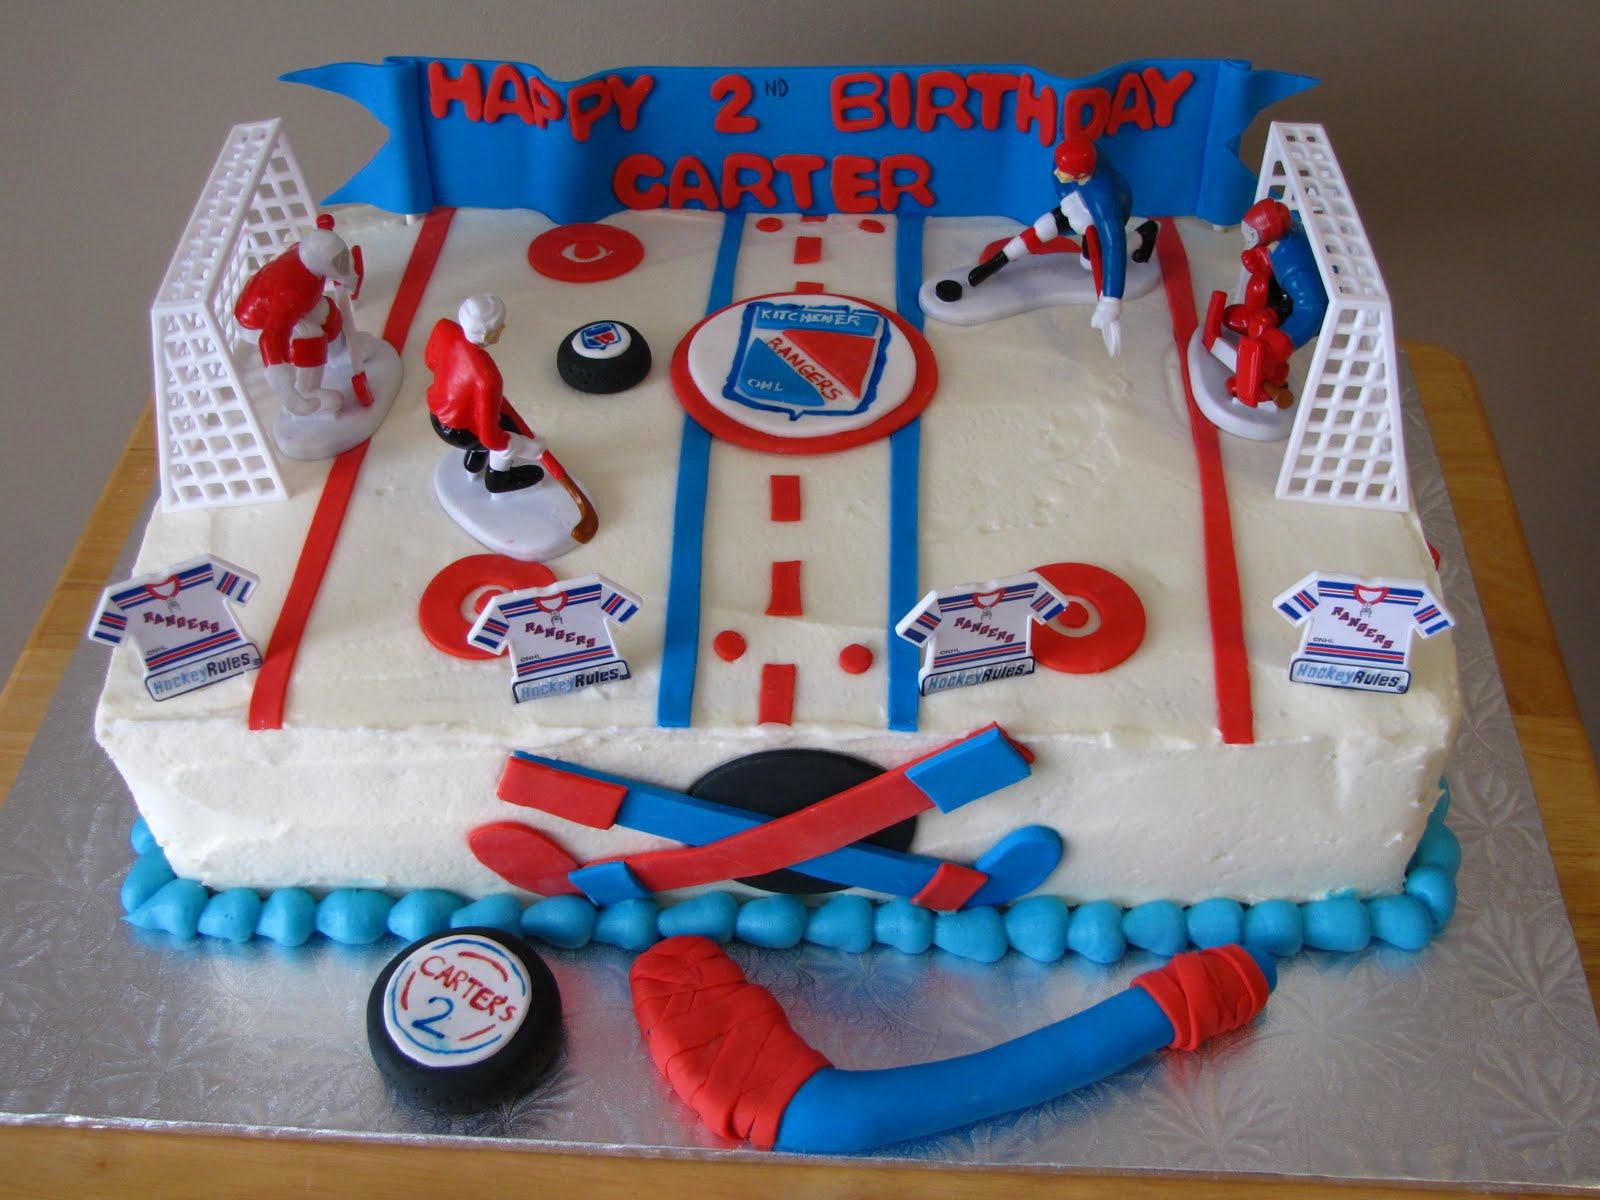 Cake Decorating Hockey Cake Ideas and Designs